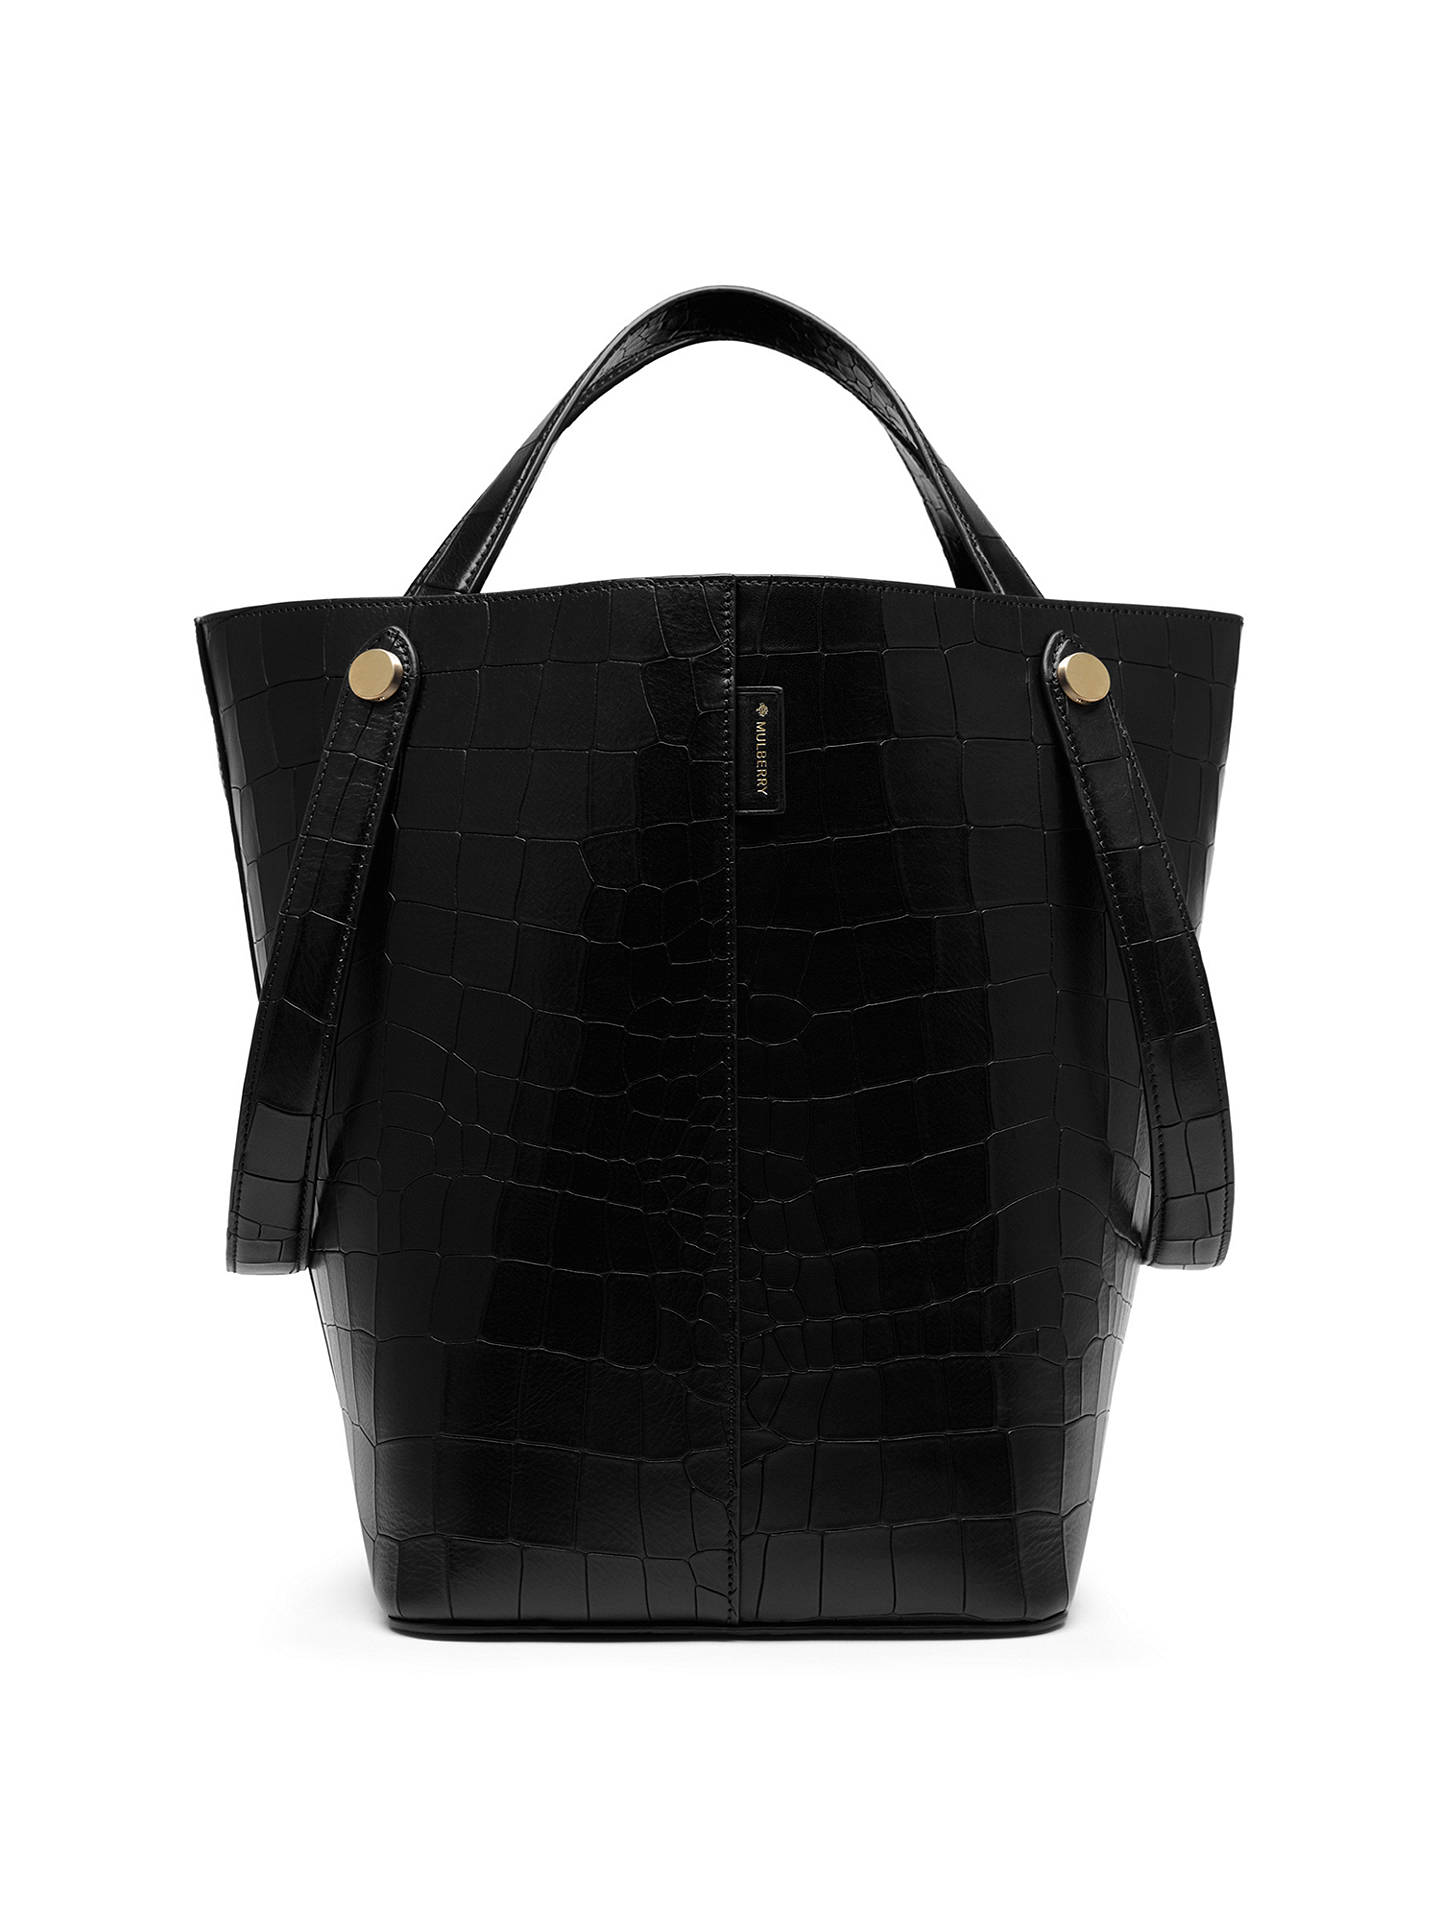 5f26221285 Buy Mulberry Kite Embossed Tote Bag